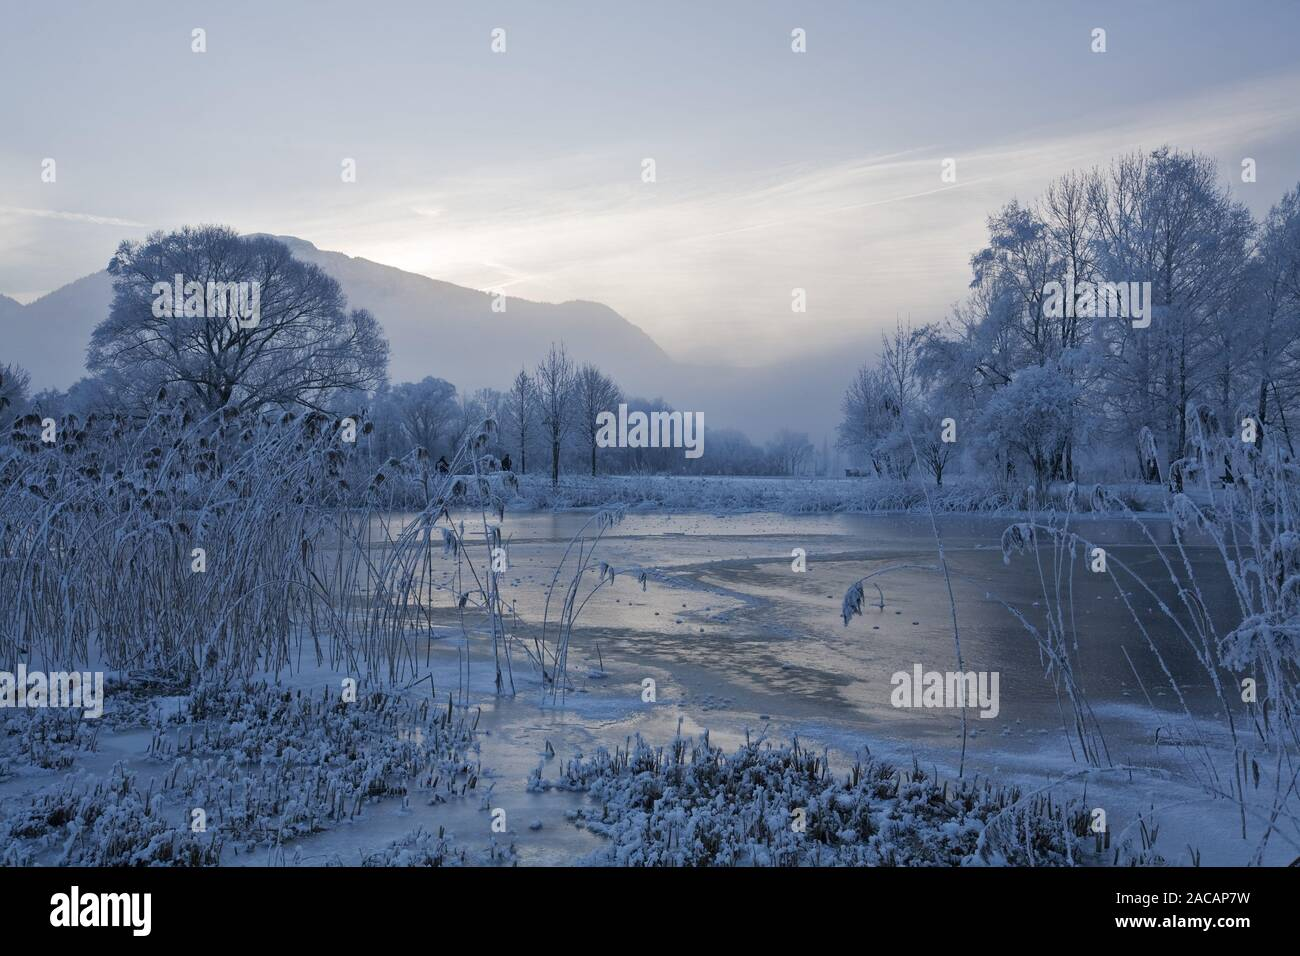 reeds and boathouses at lake kochelsee at winter, upper bavaria, germany Stock Photo